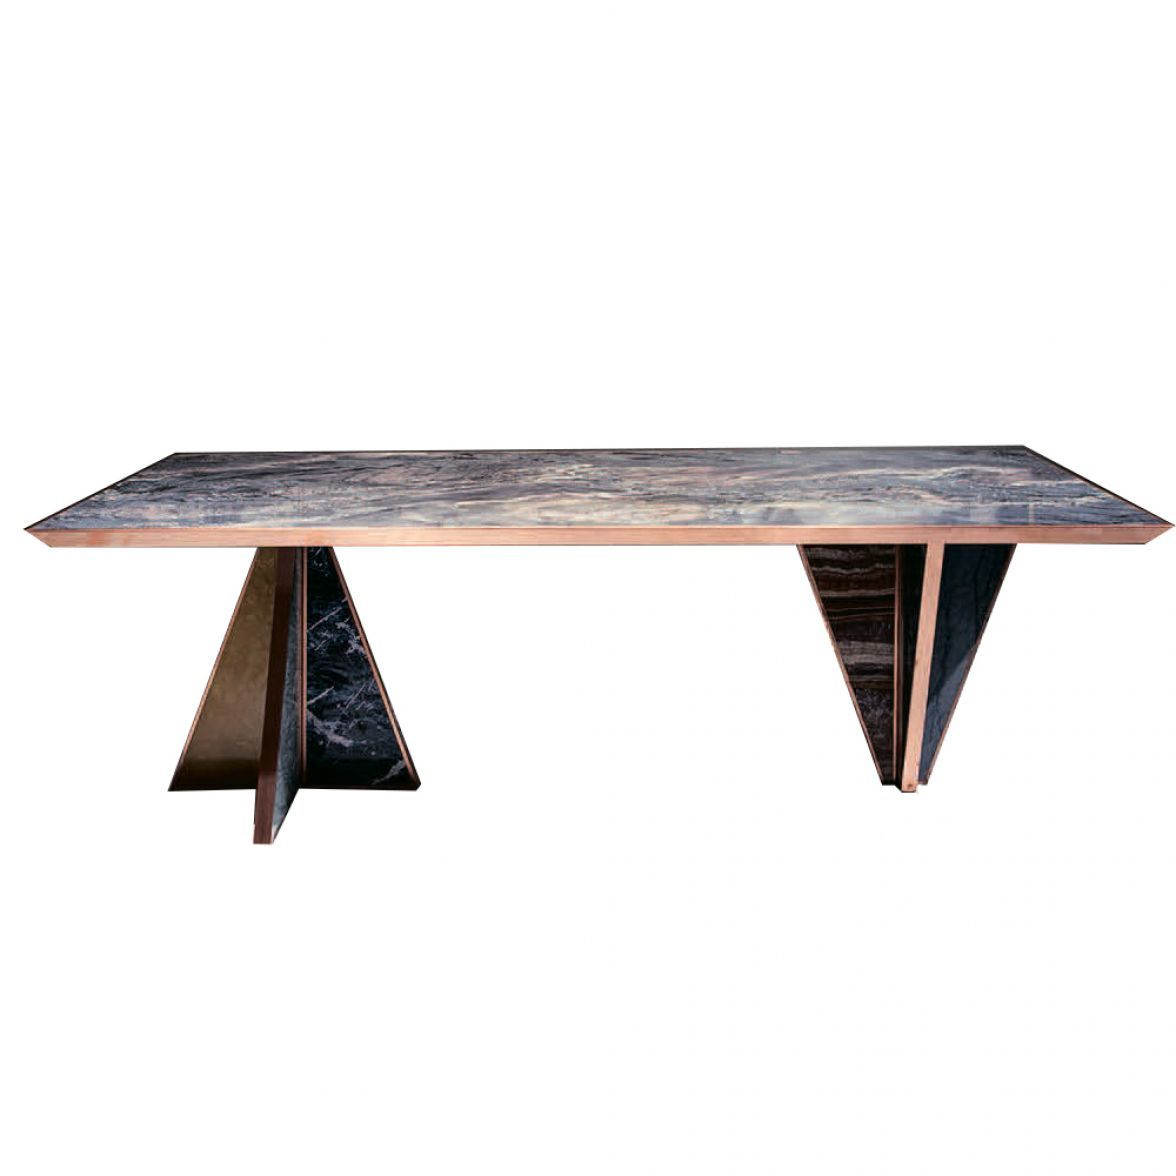 Keope table фото цена